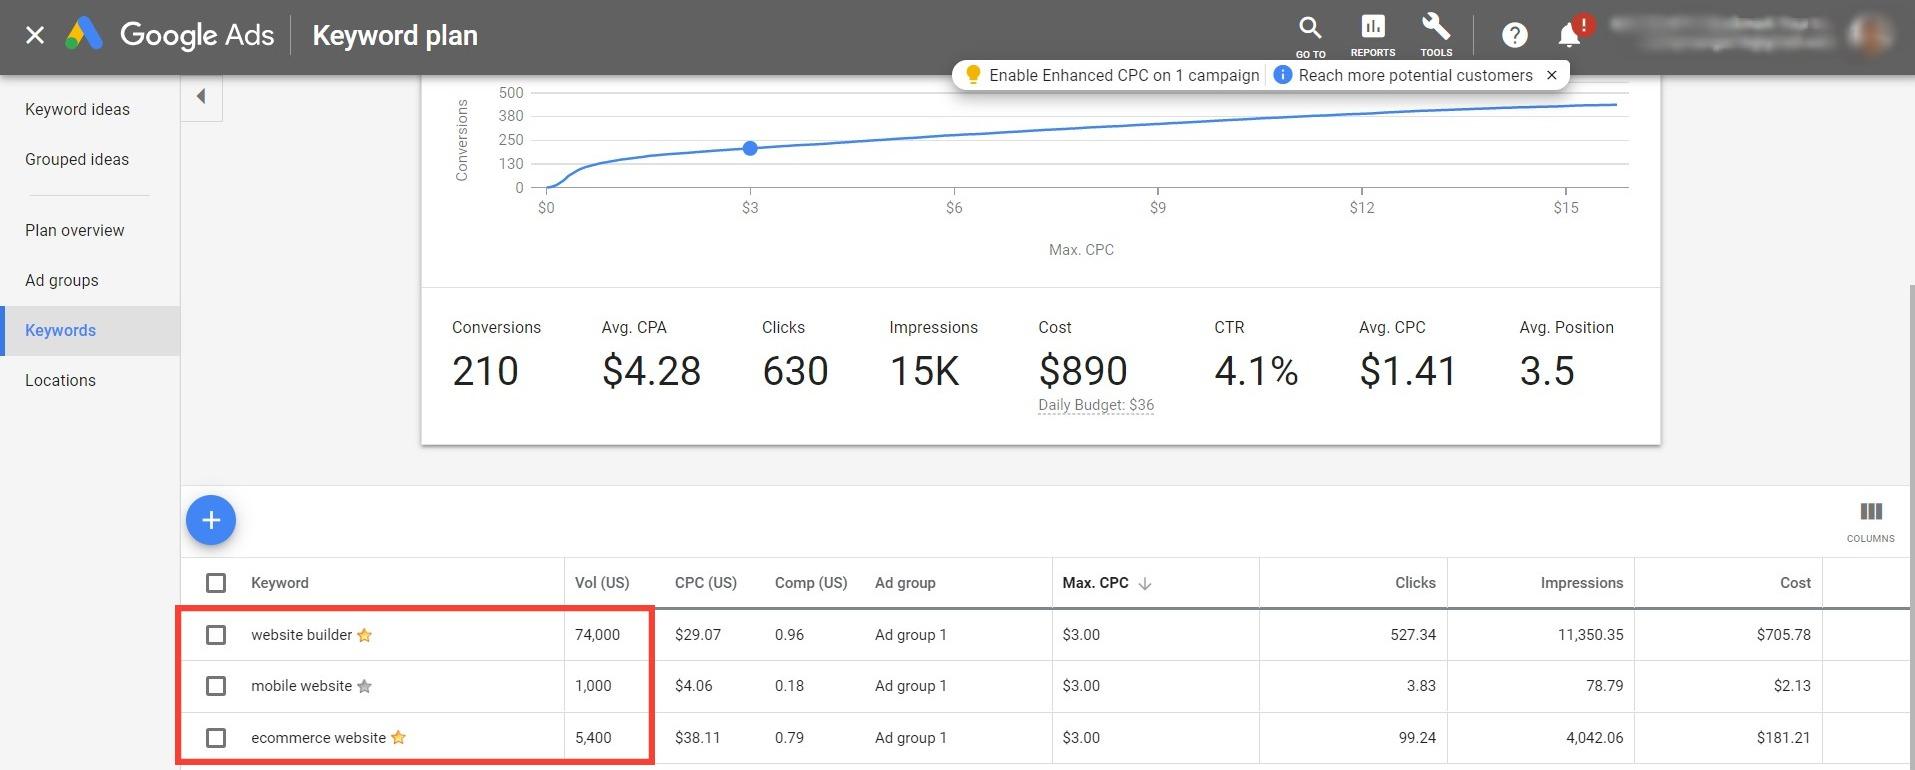 Keyword forecasts - Bookmark Your Life Inc. - Google Ads